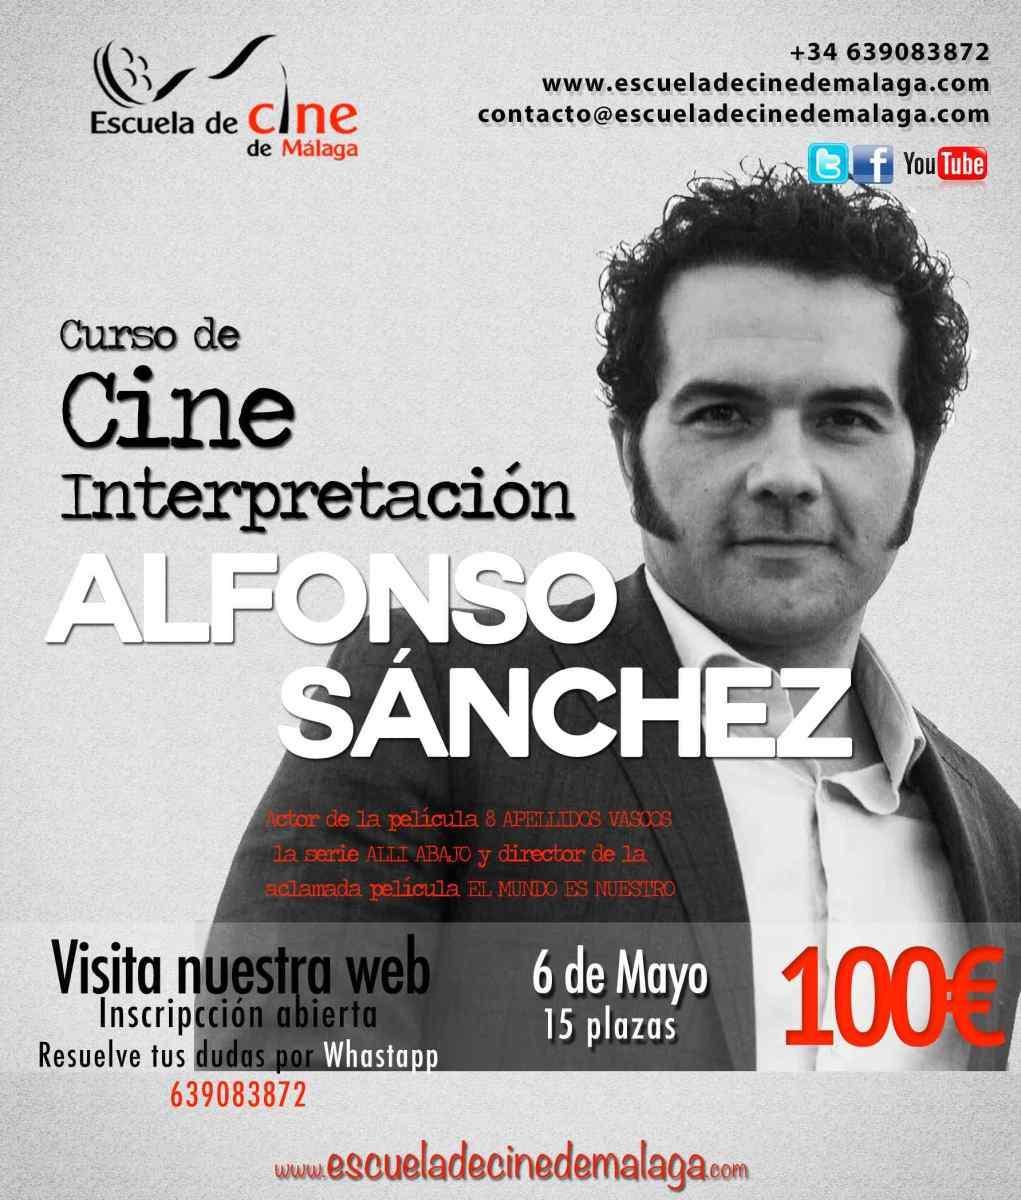 Curso de Cine Alfonso Sanchez